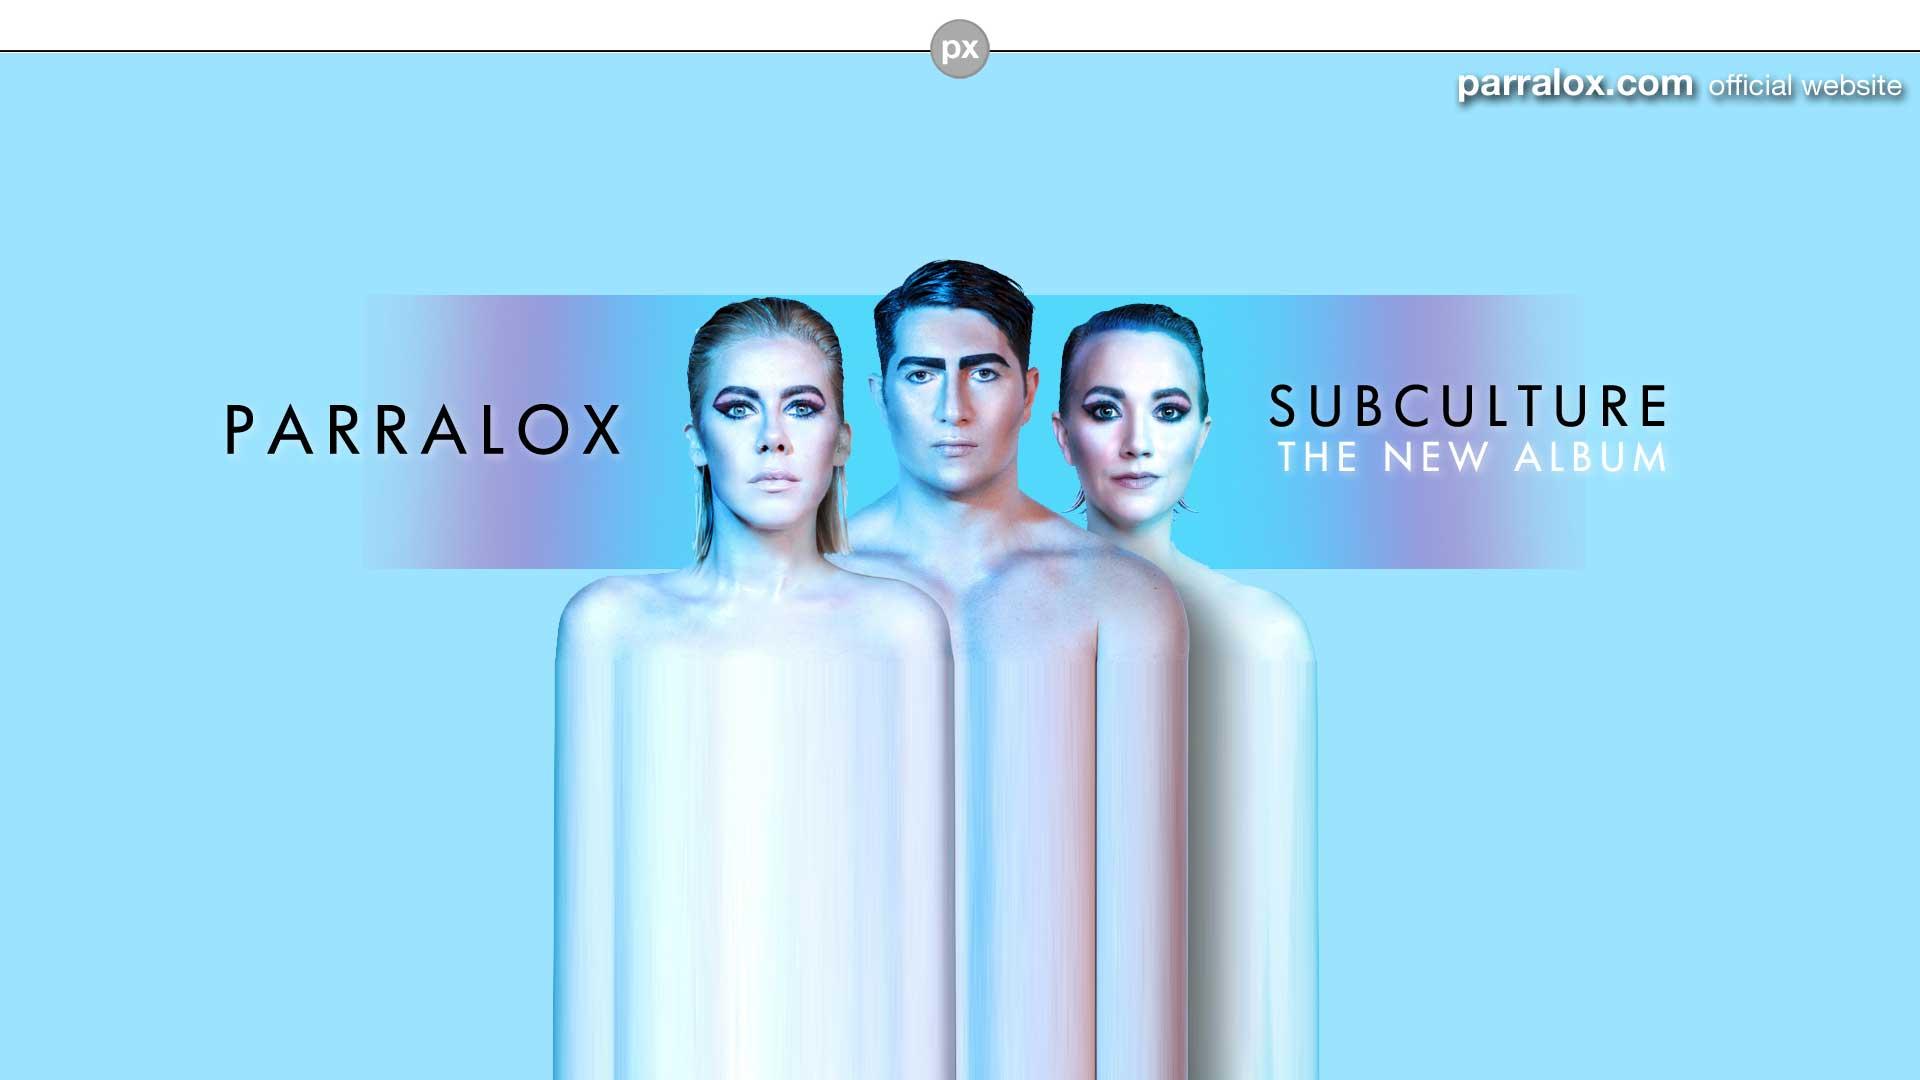 Parralox - Subculture (the new album)